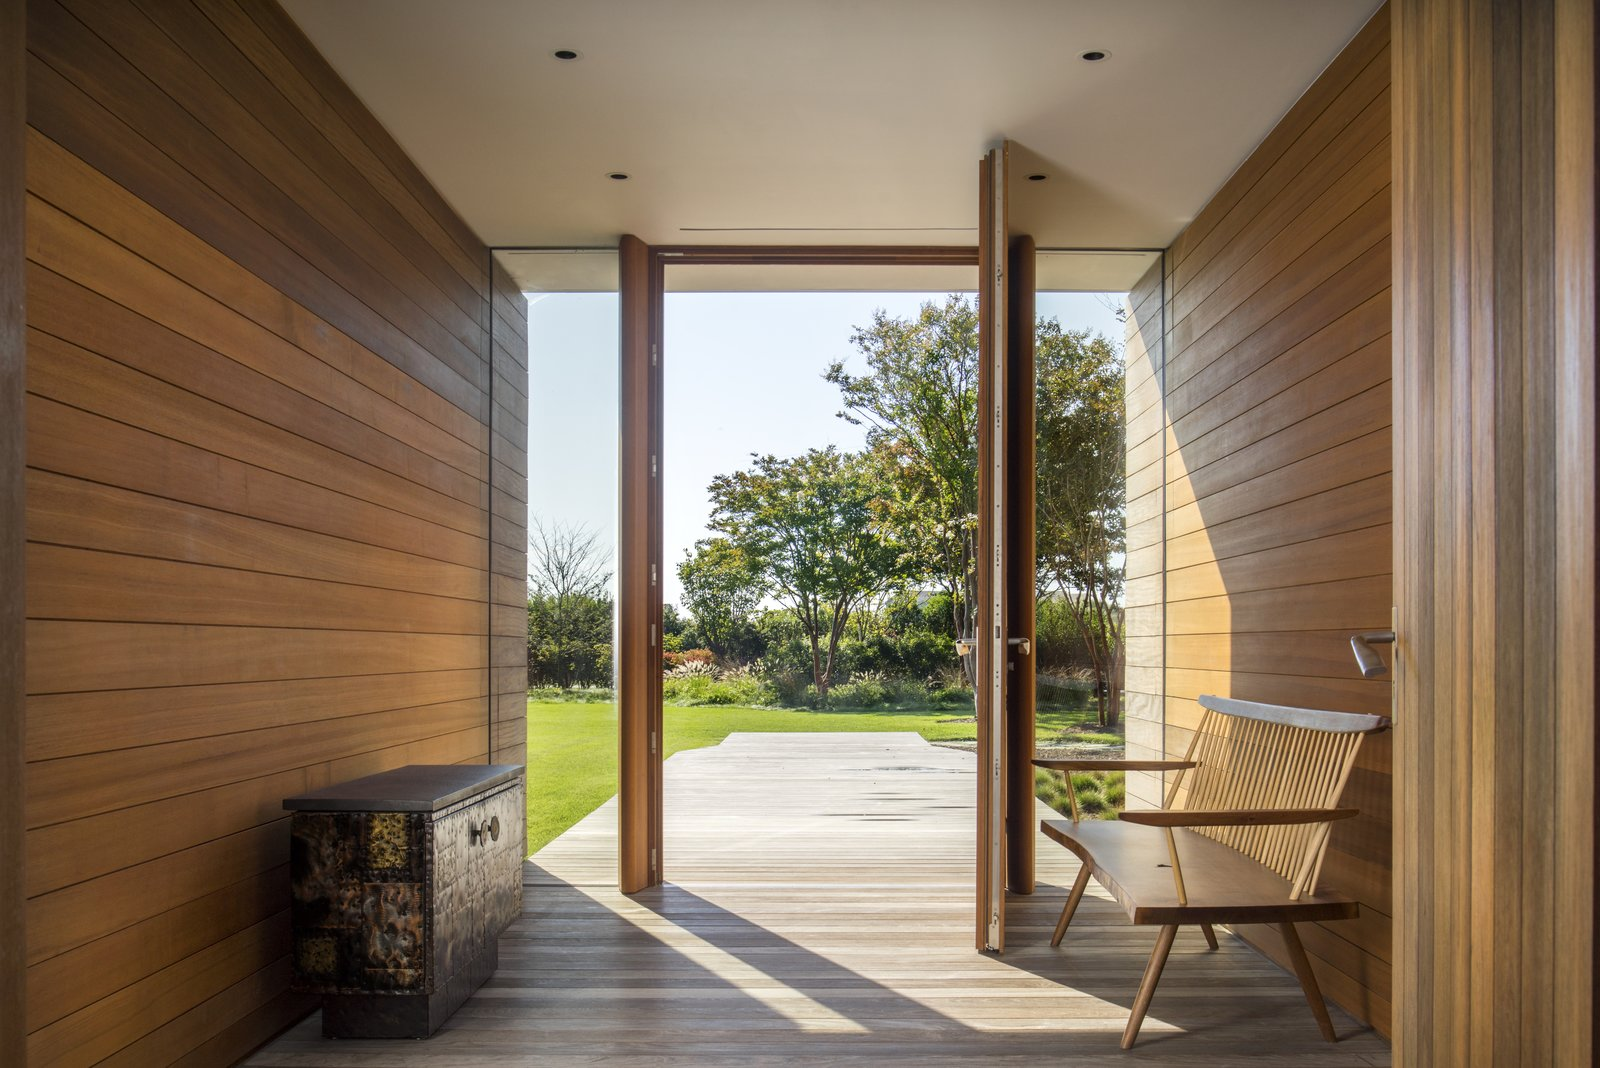 Hallway and Medium Hardwood Floor  Best Photos from Hamptons Residence